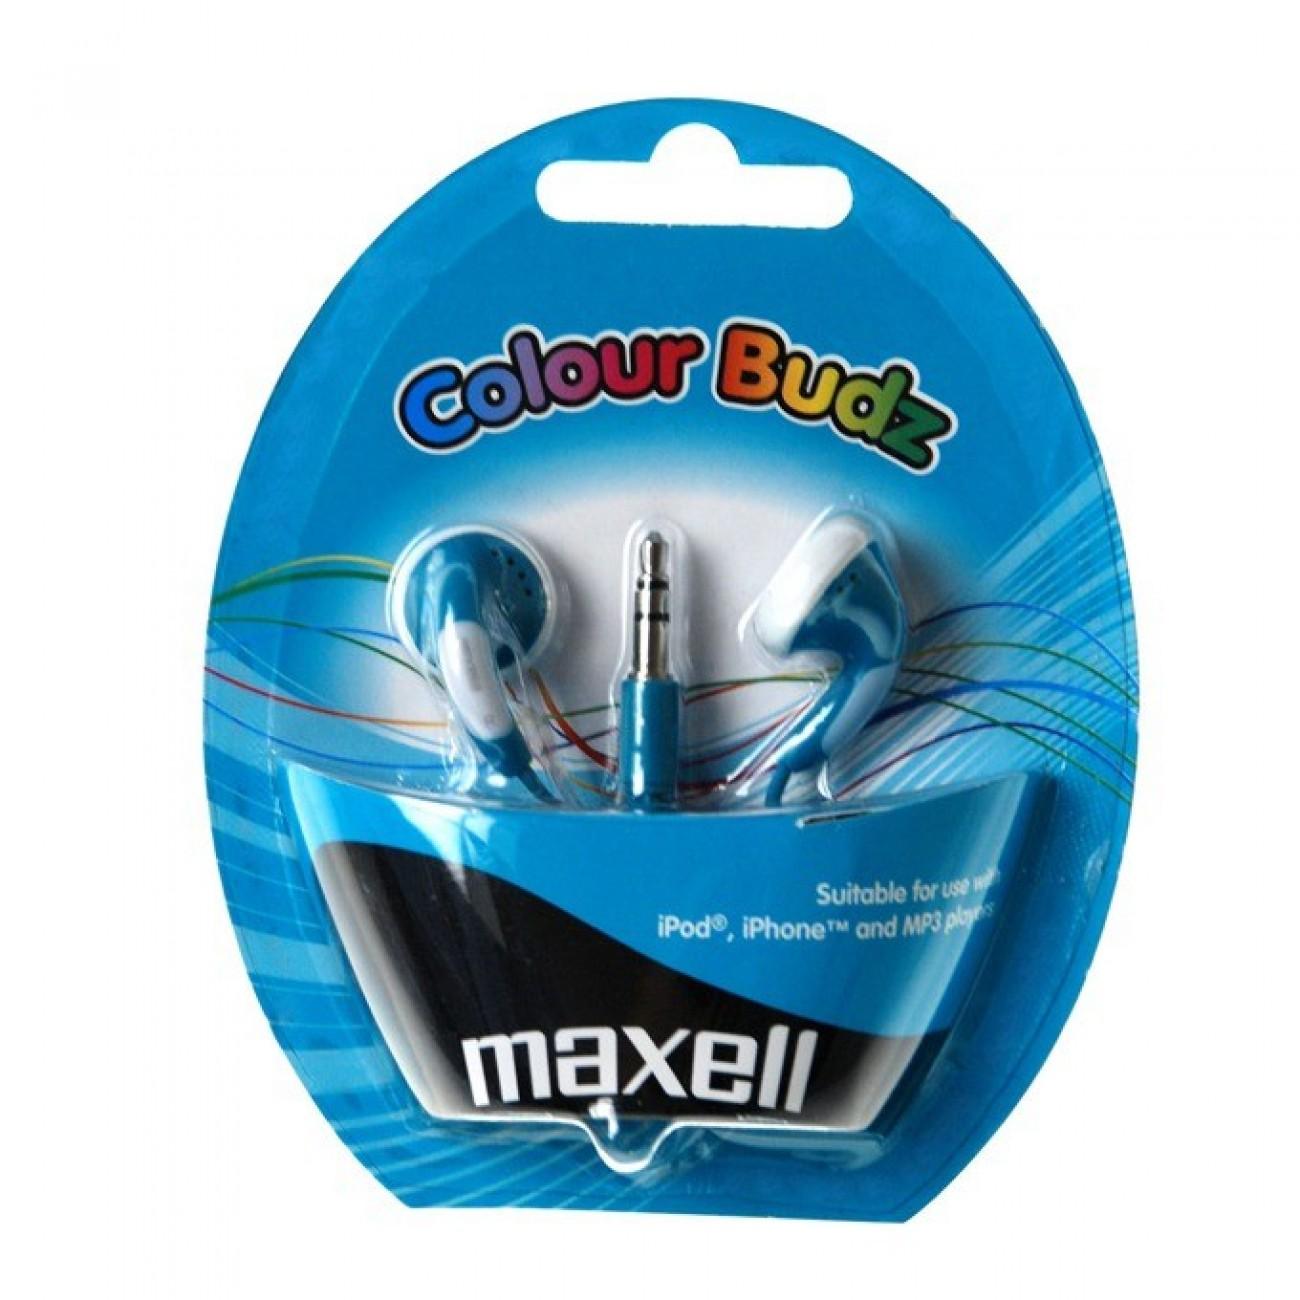 Слушалки MAXELL color BUDS, сини, тапи в Слушалки -  | Alleop